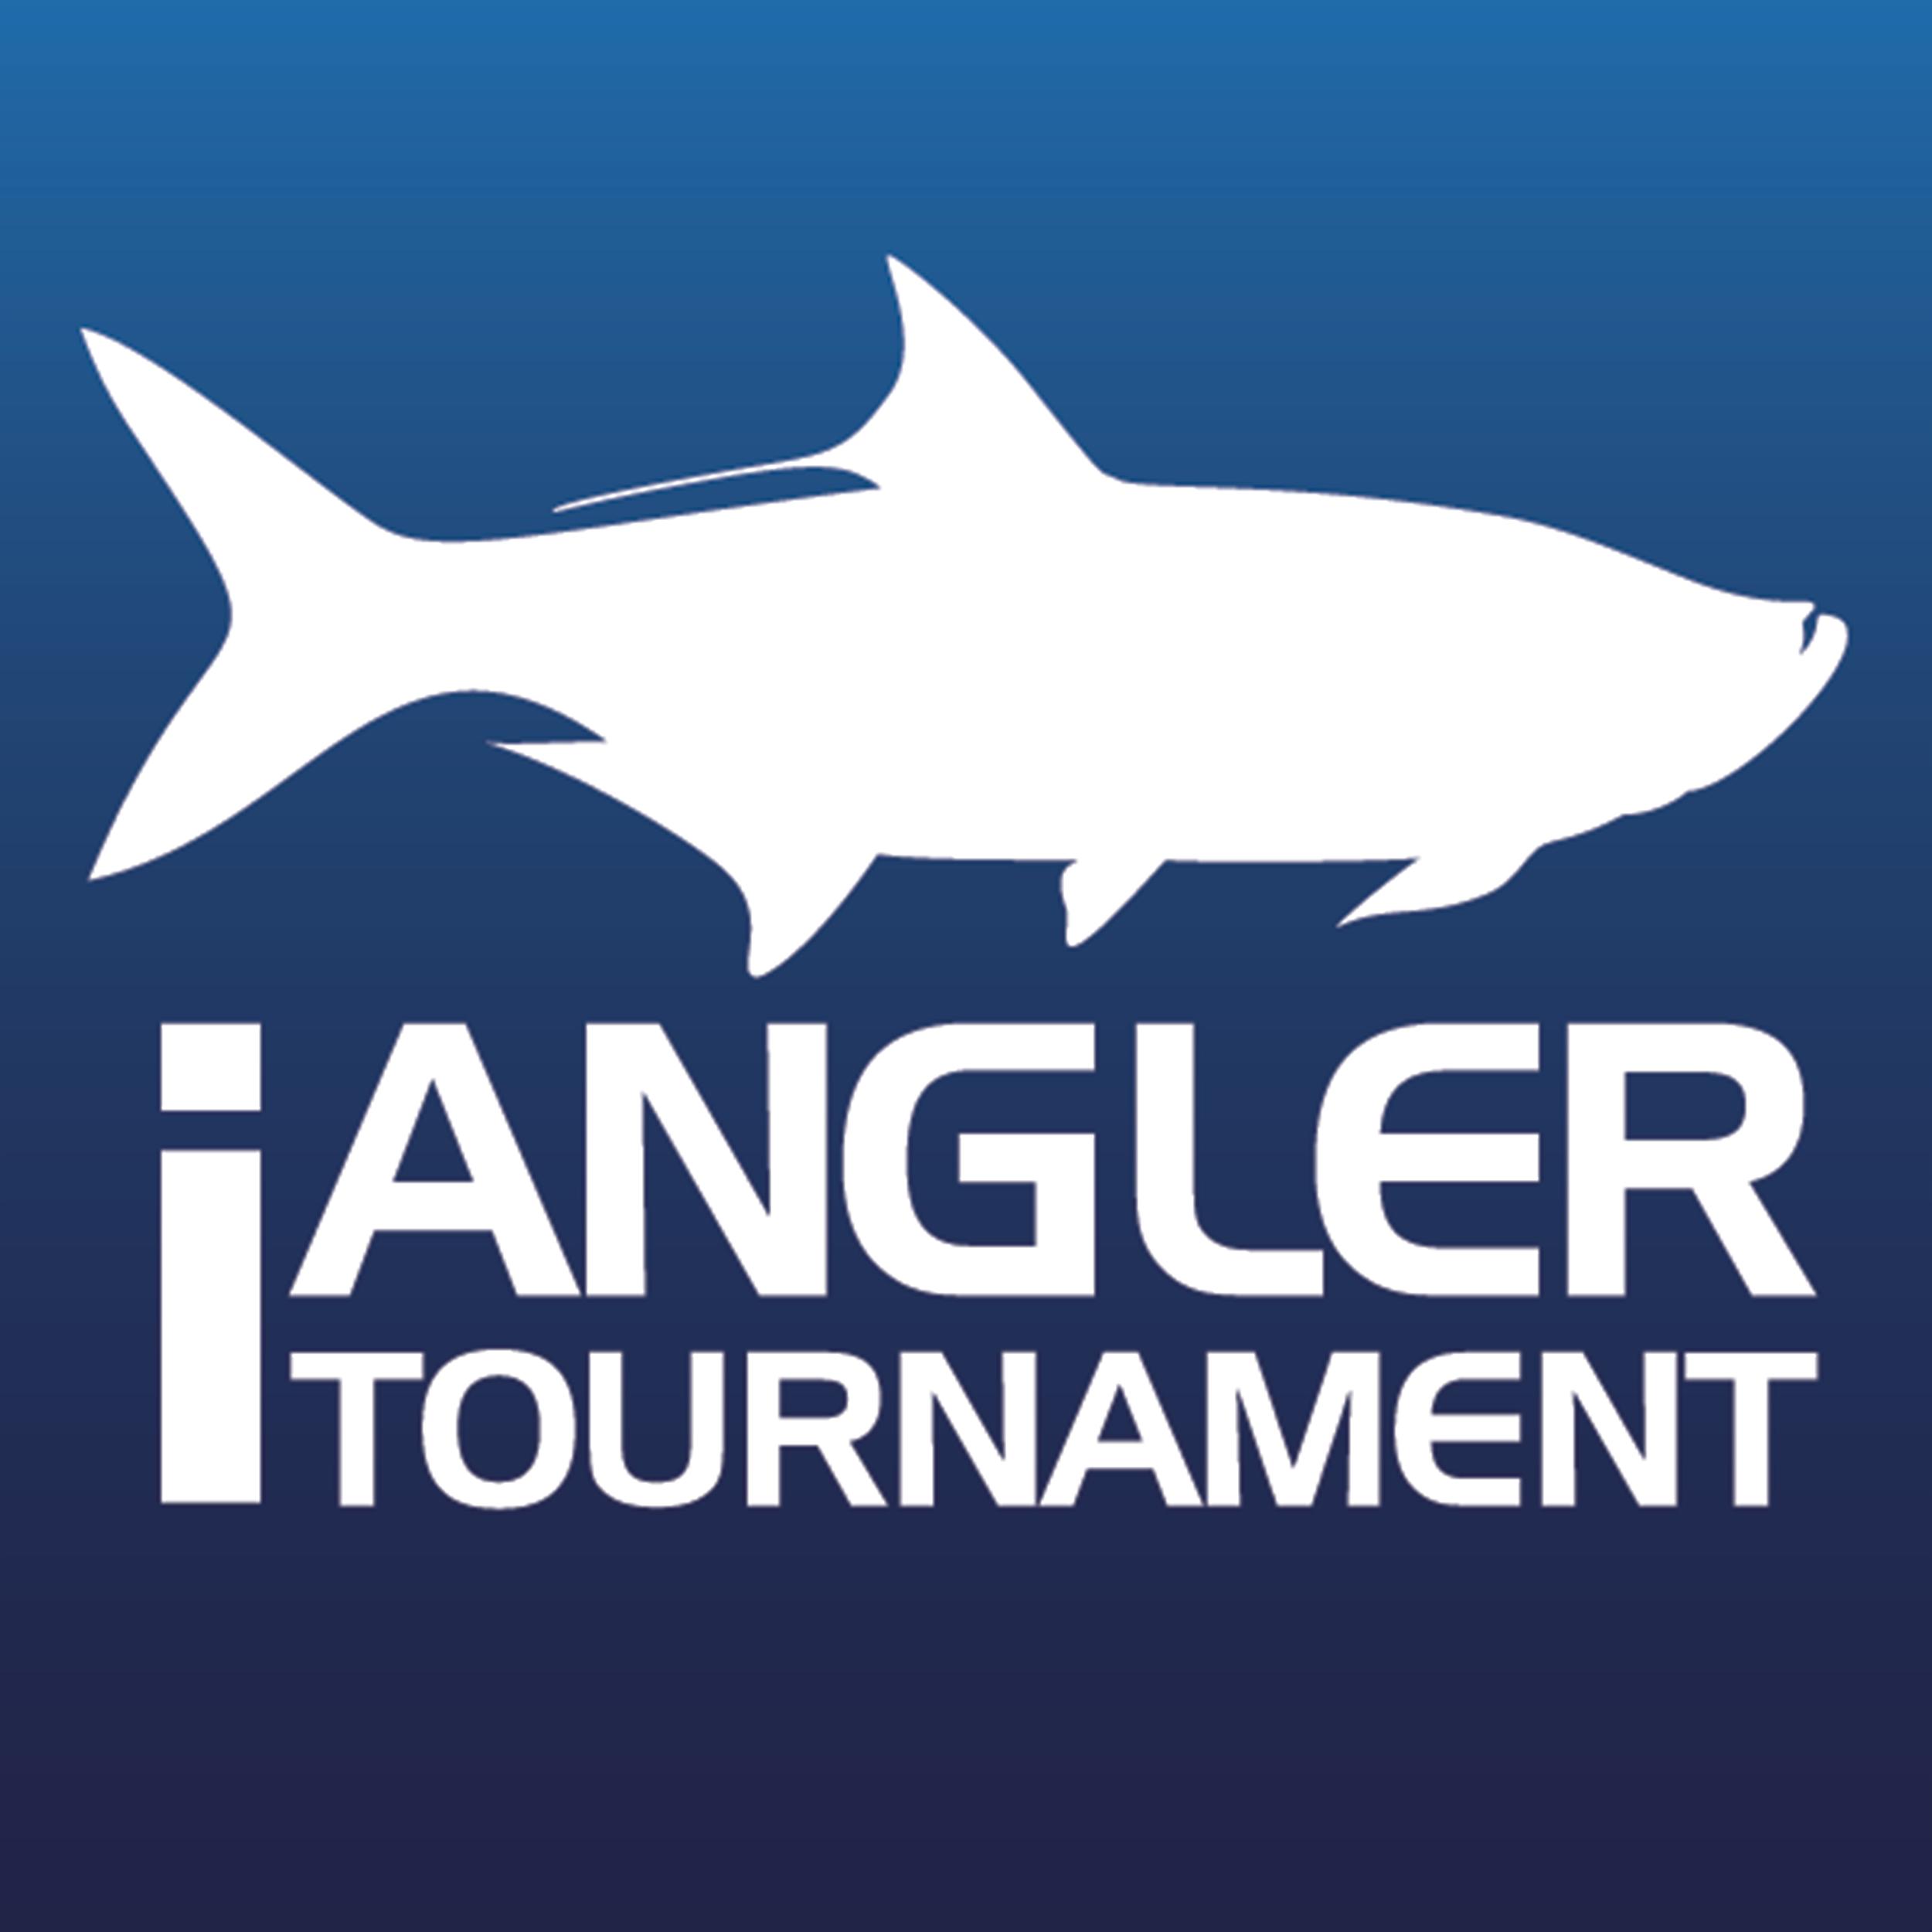 iAngler Tournament - Tarpon Logo